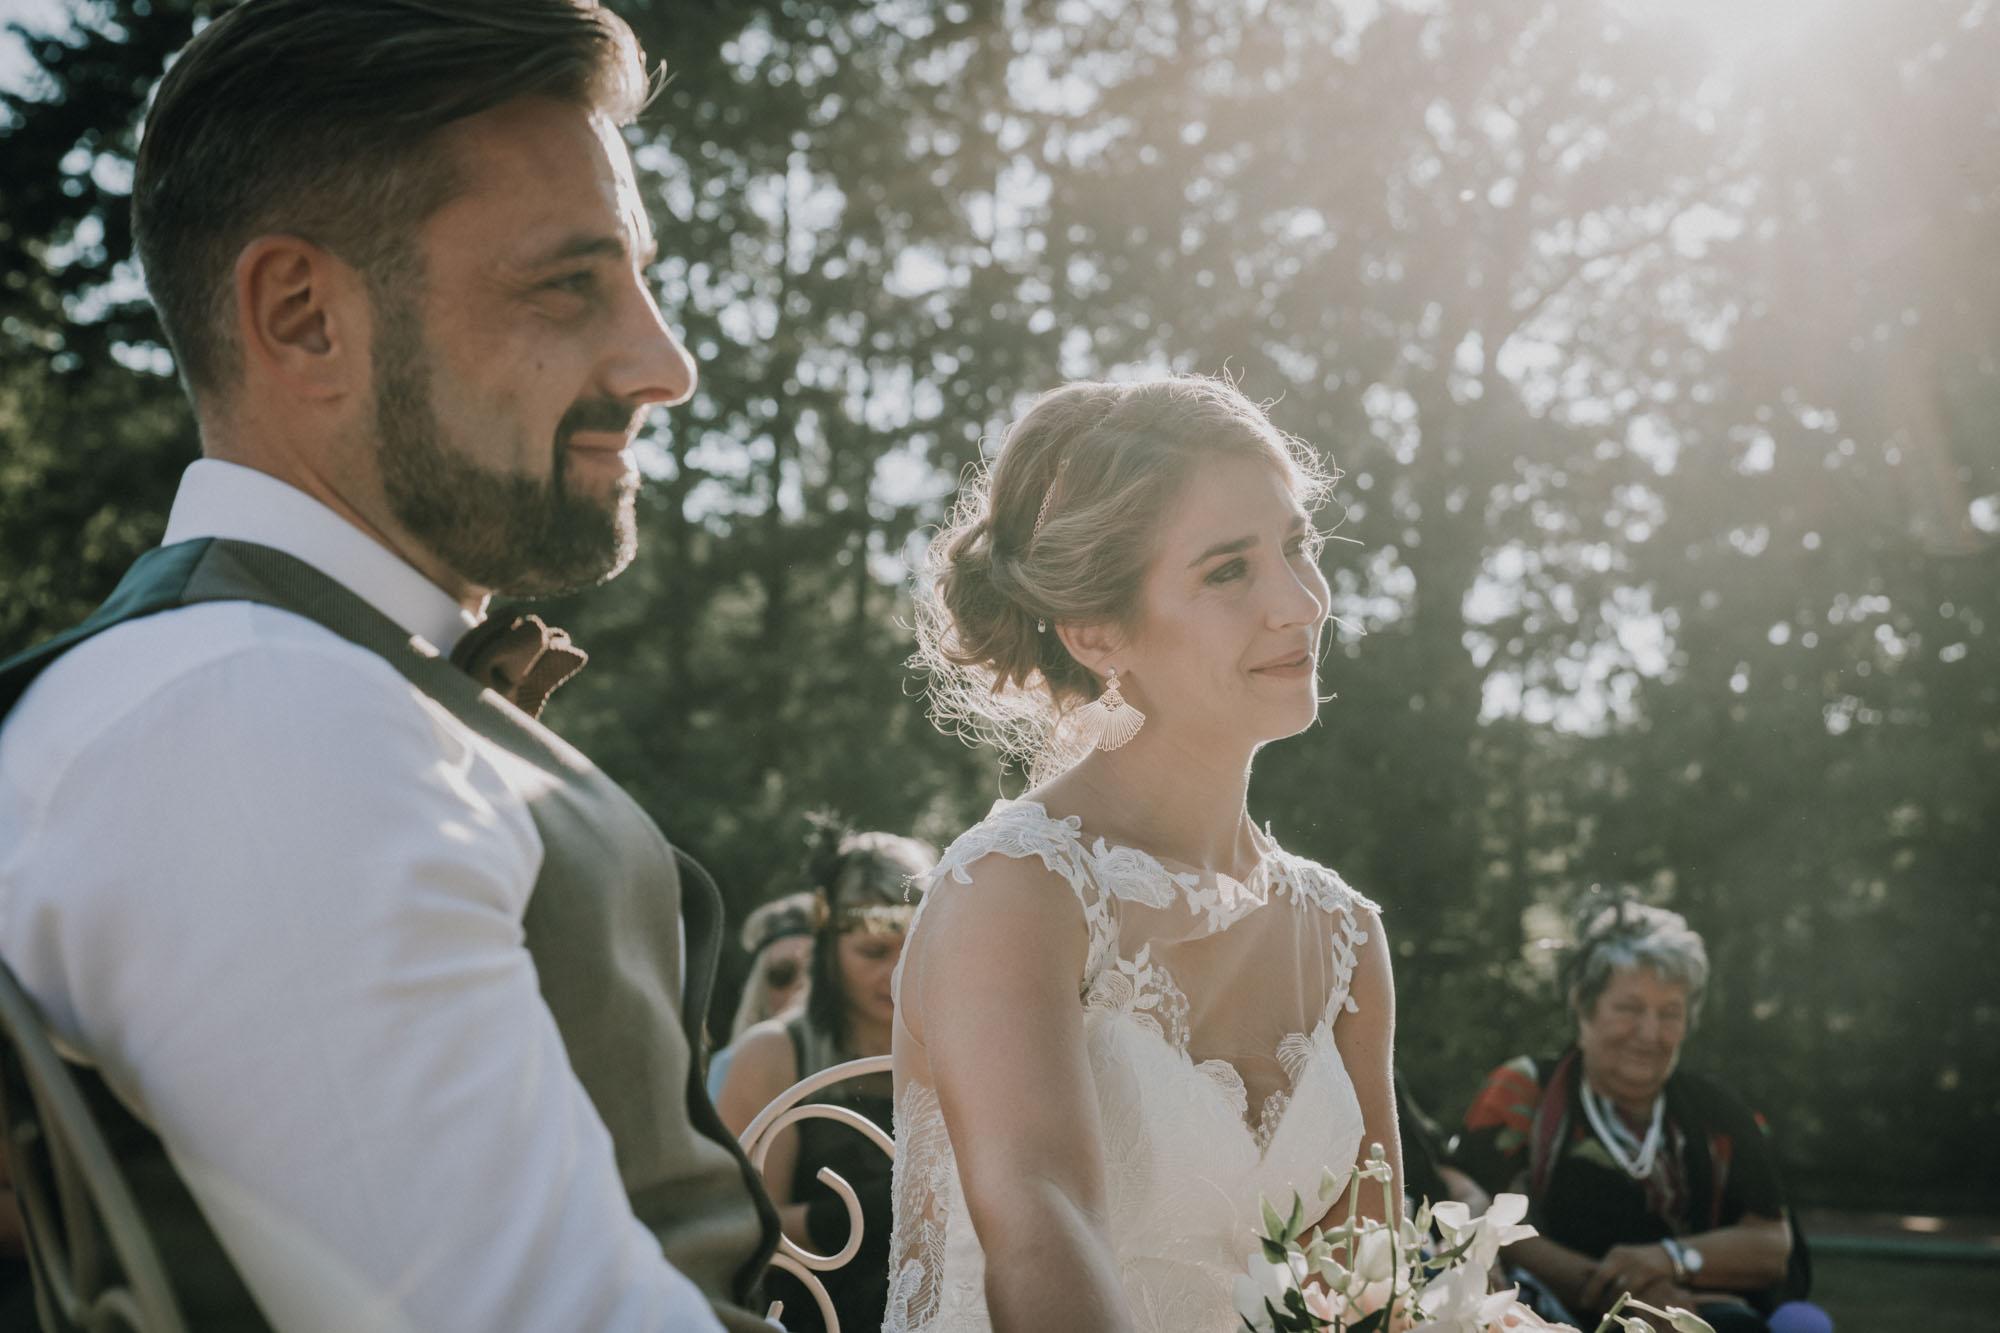 2018-09-29 - LD8_1261 - photographe mariage lyon - laurie diaz - www.lauriediazweeding.com.jpg